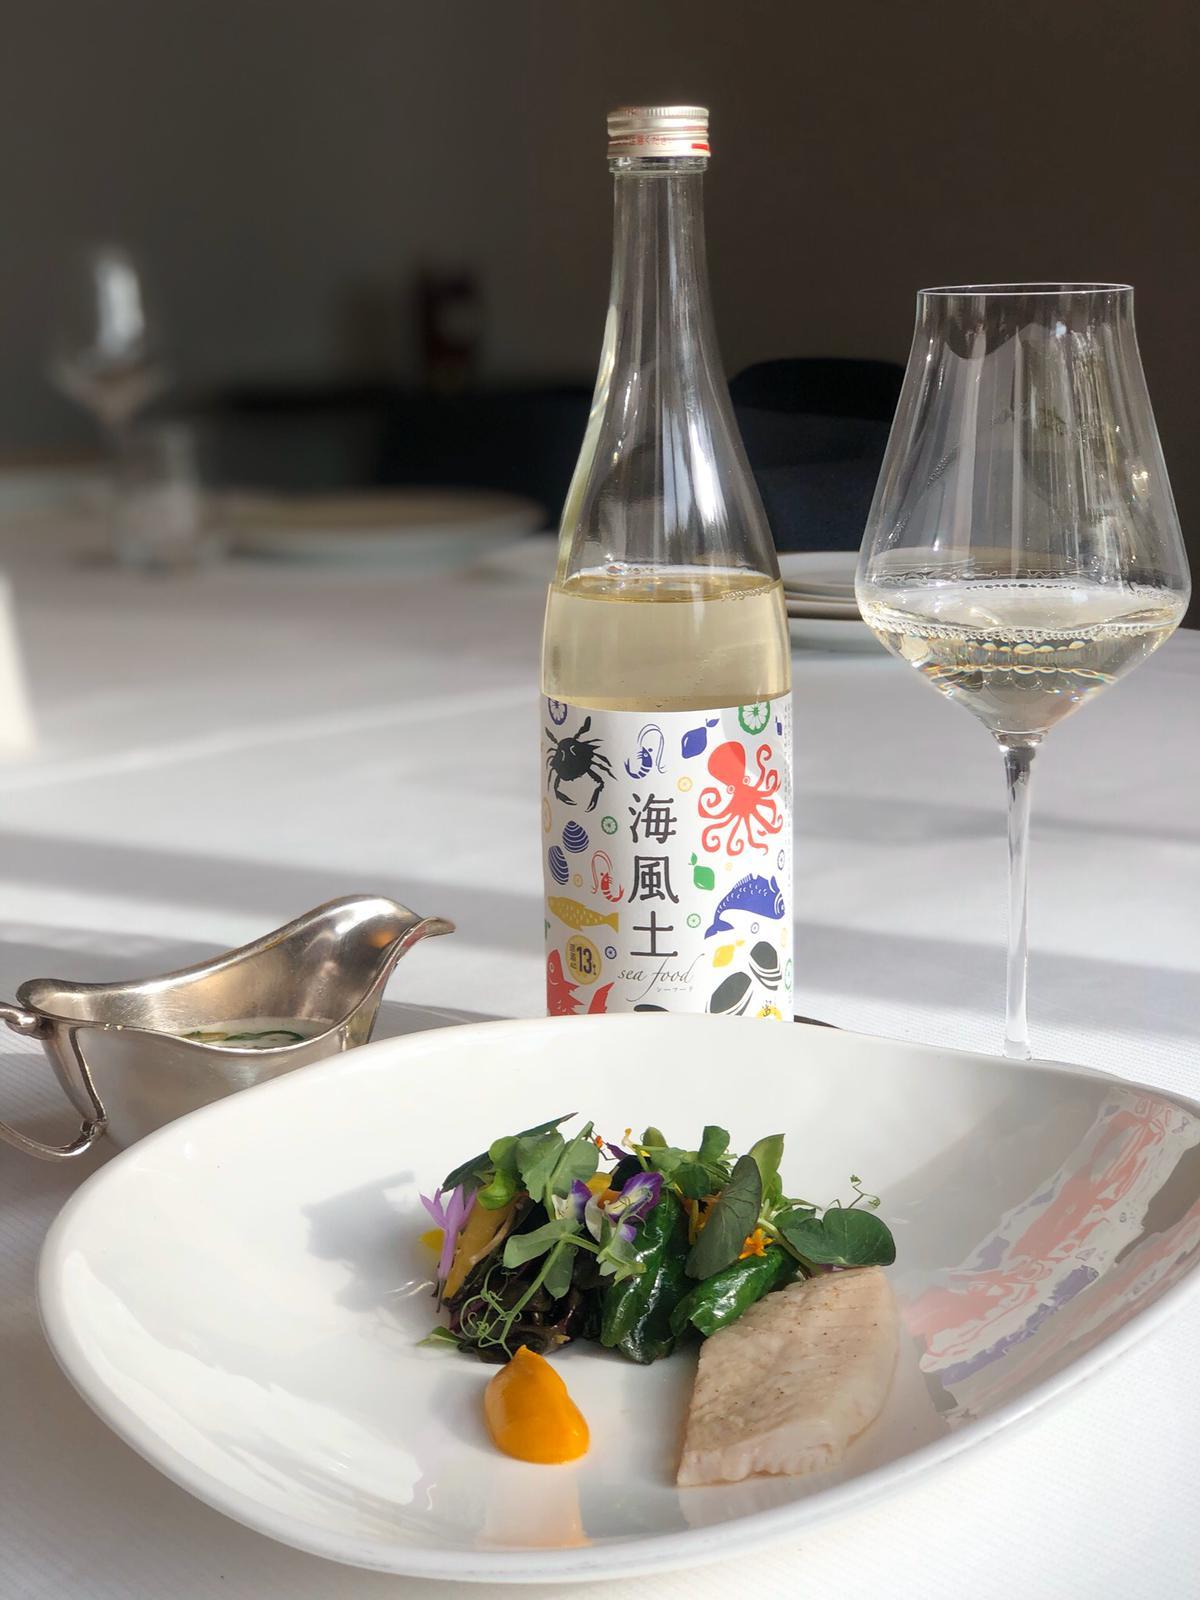 202204 Le fukucho « Seafood Shirokoji Junmai Genshu » de la maison saké Imada Shuzo Honten